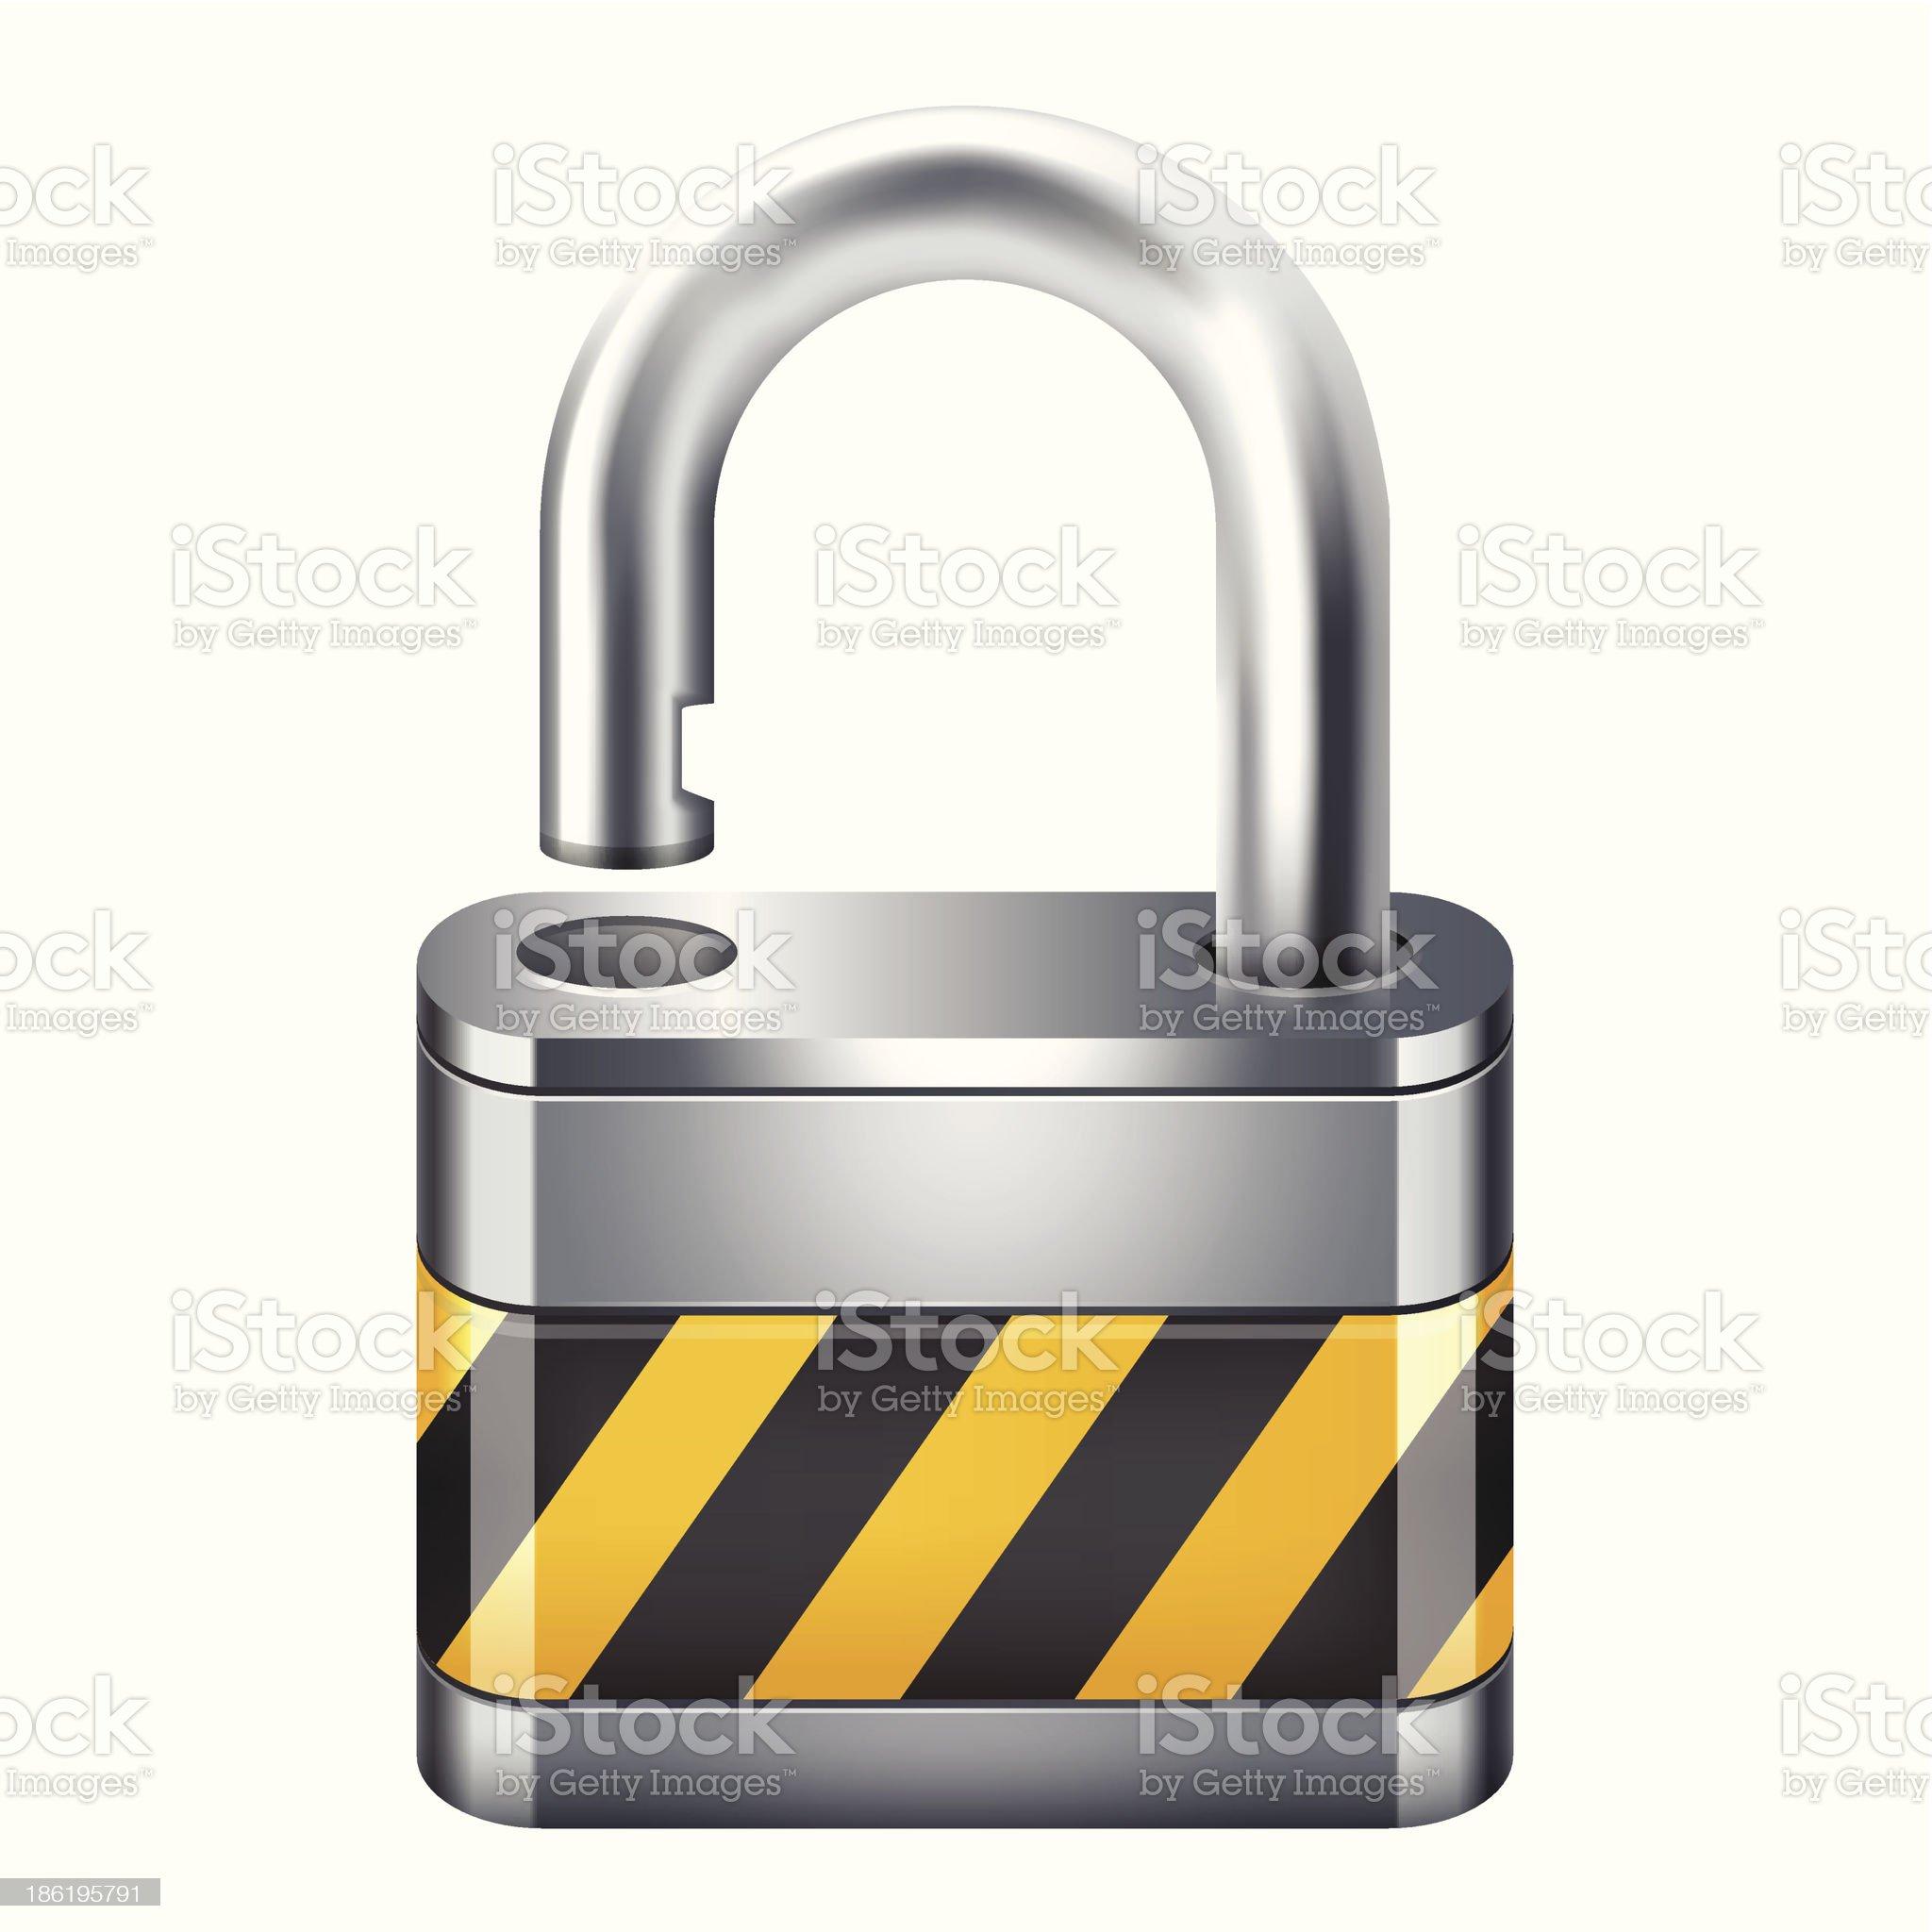 open padlock icon royalty-free stock vector art